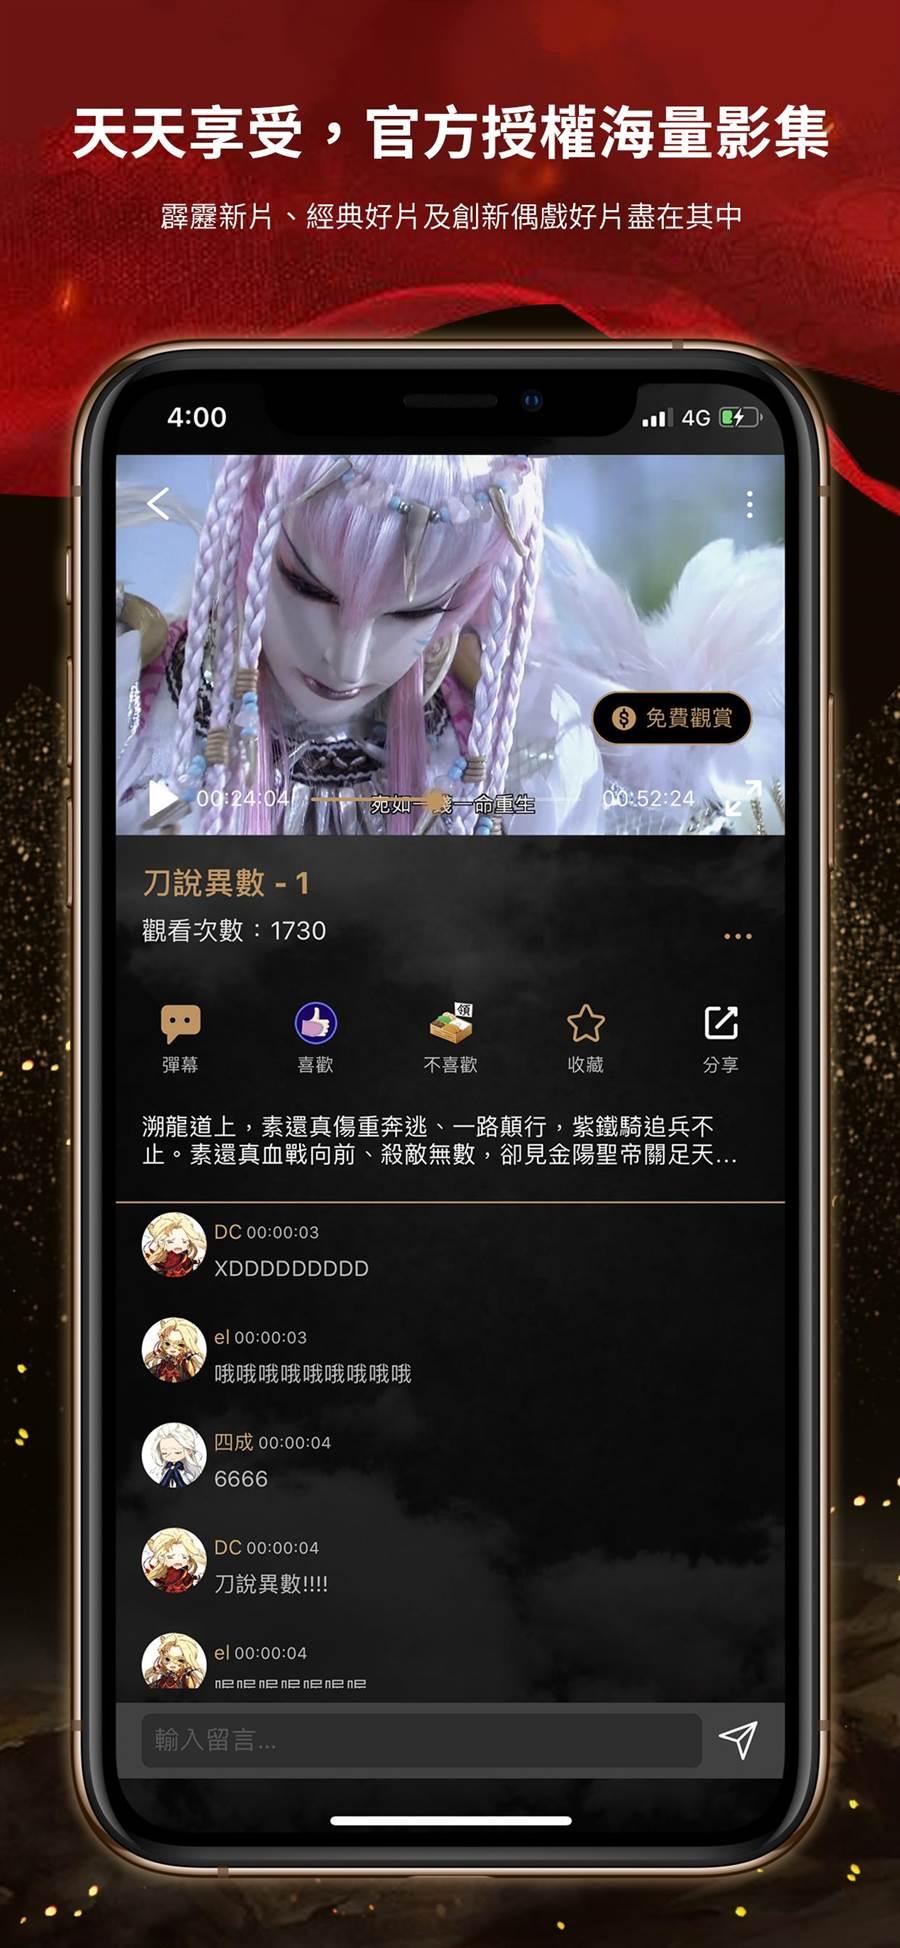 iOS版影片內頁。(霹靂國際多媒體提供)